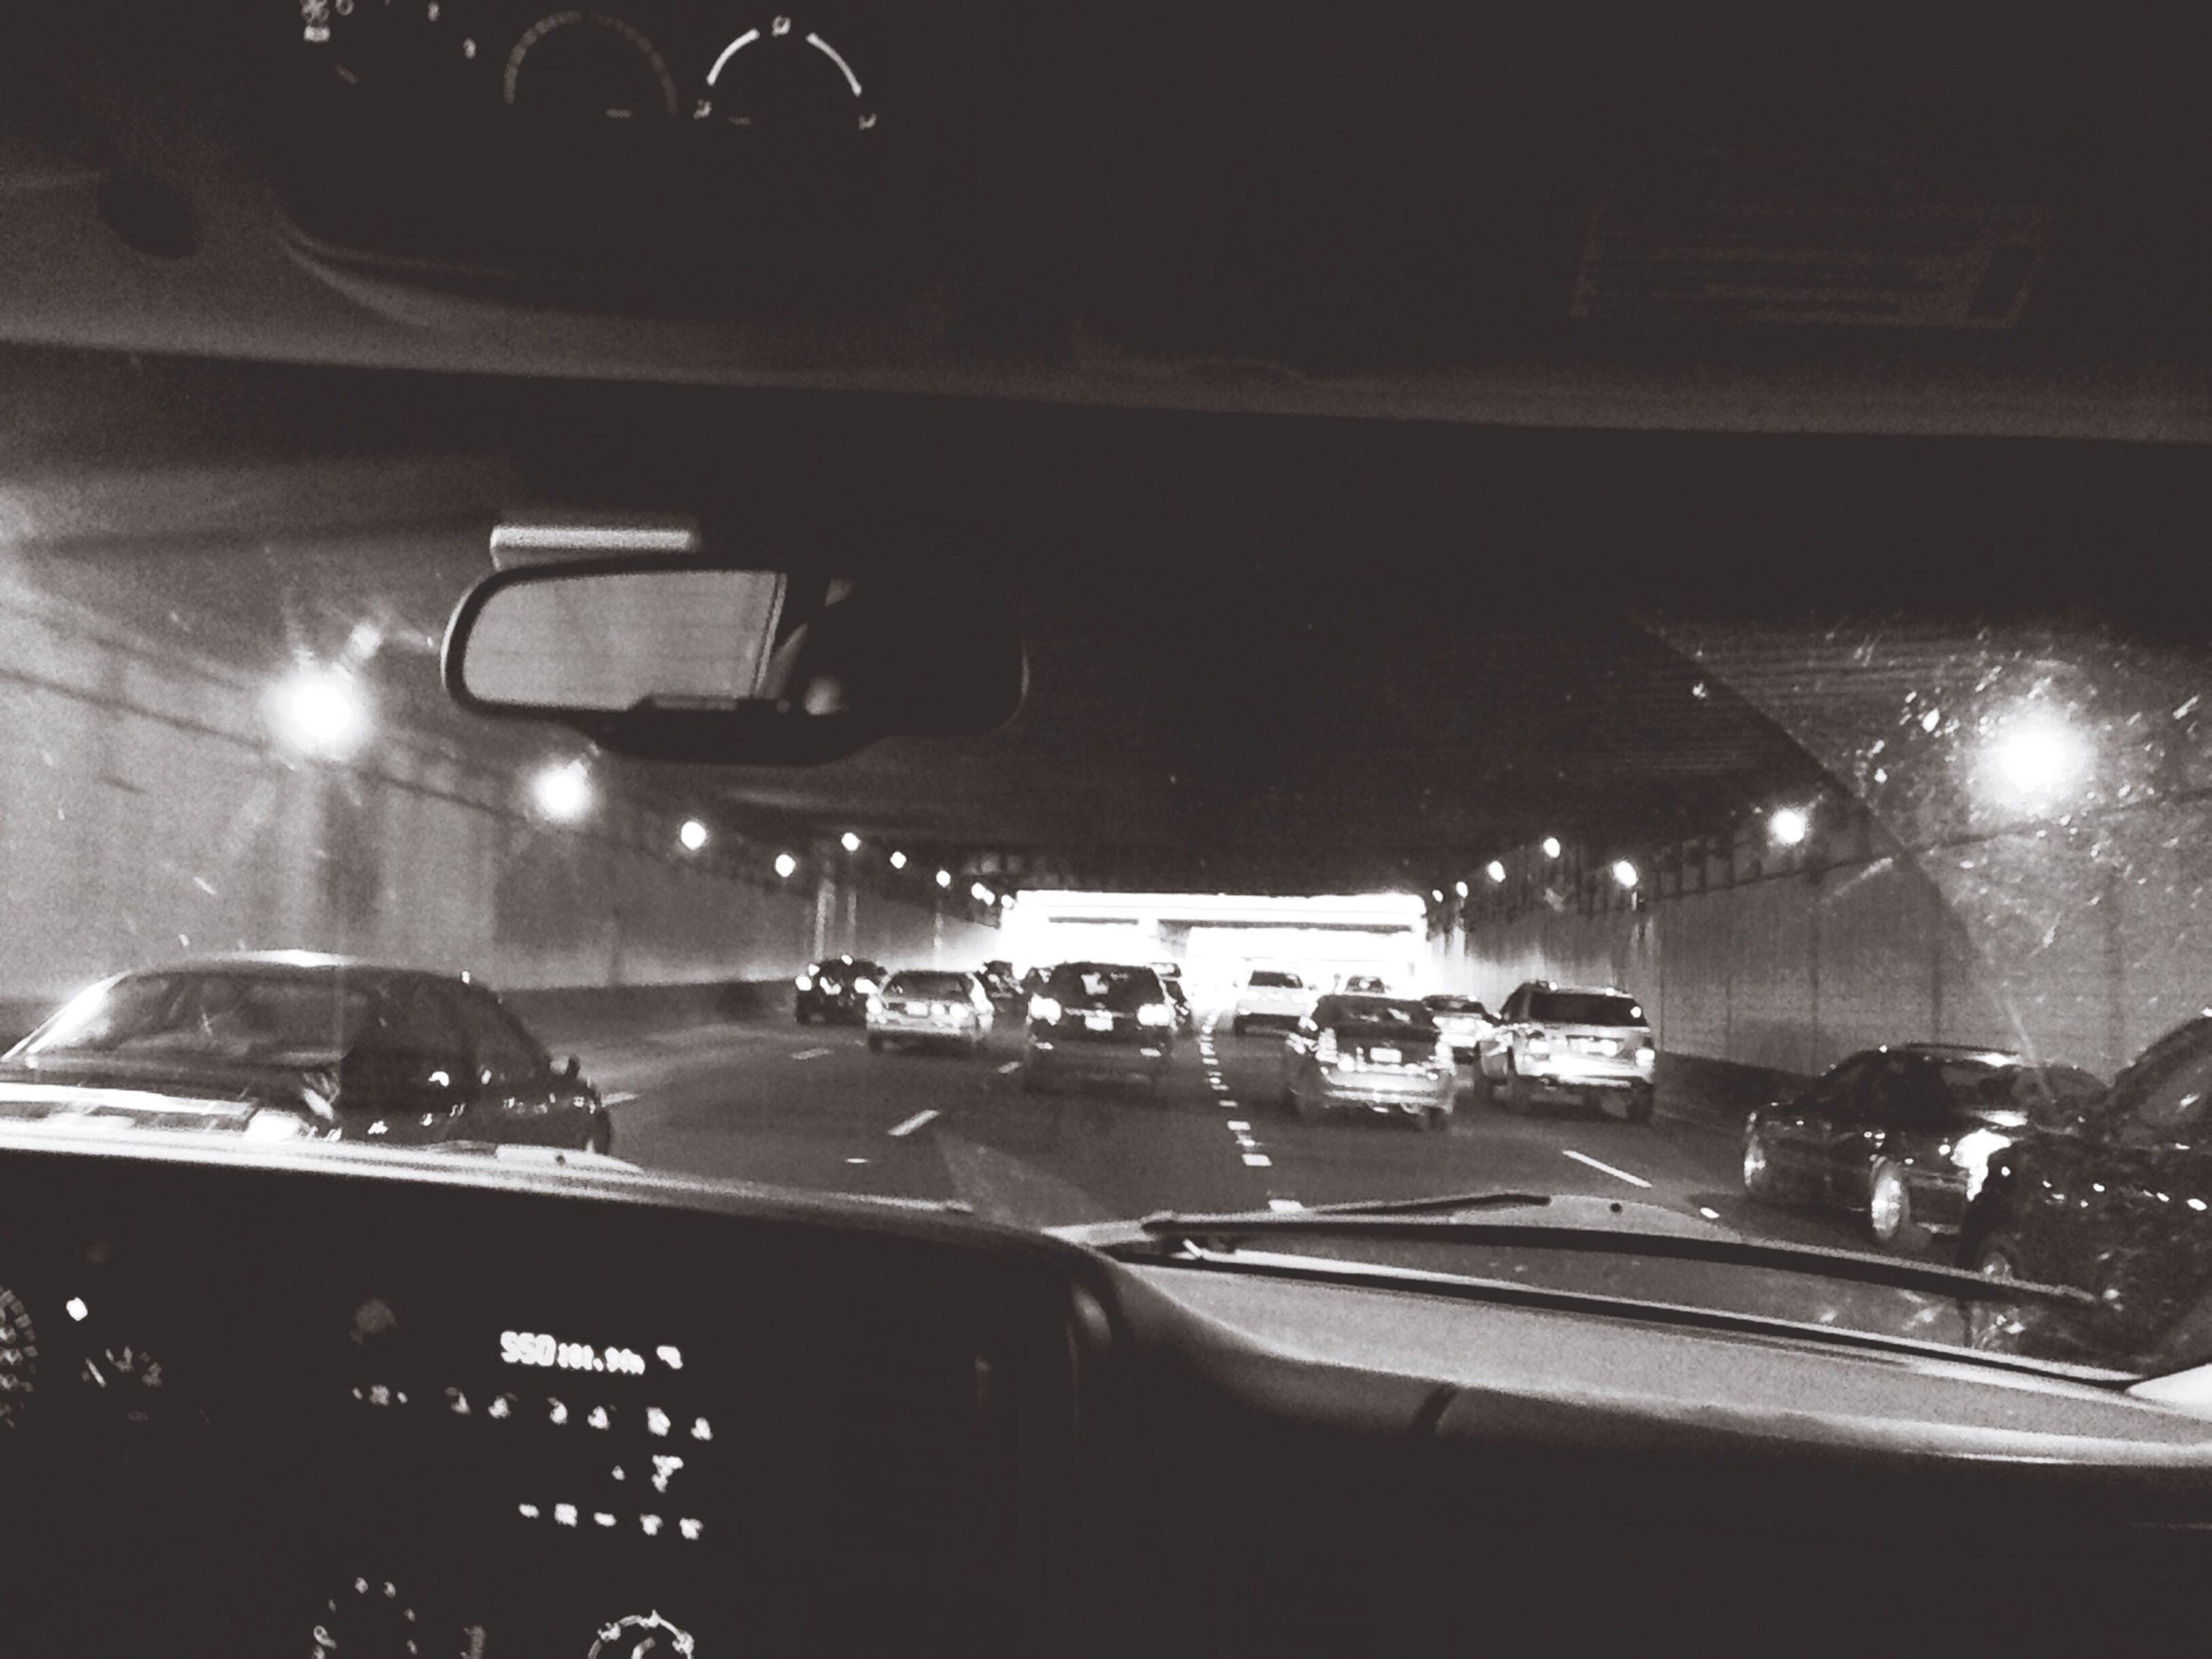 transportation, mode of transport, illuminated, land vehicle, car, night, indoors, vehicle interior, travel, lighting equipment, on the move, technology, incidental people, bus, public transportation, men, stationary, motion, traffic